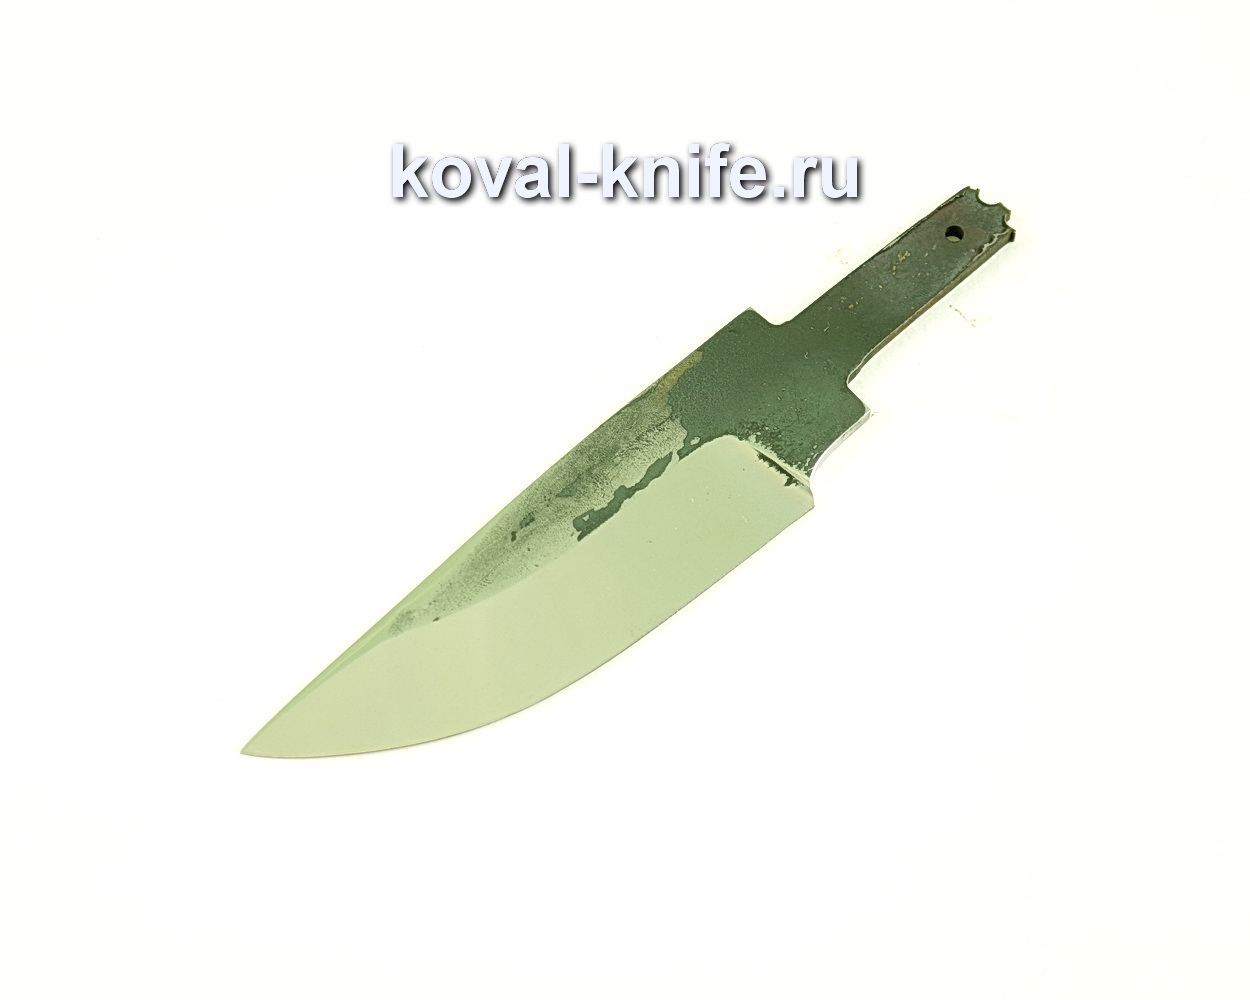 Клинок Норвег (сталь 110х18)